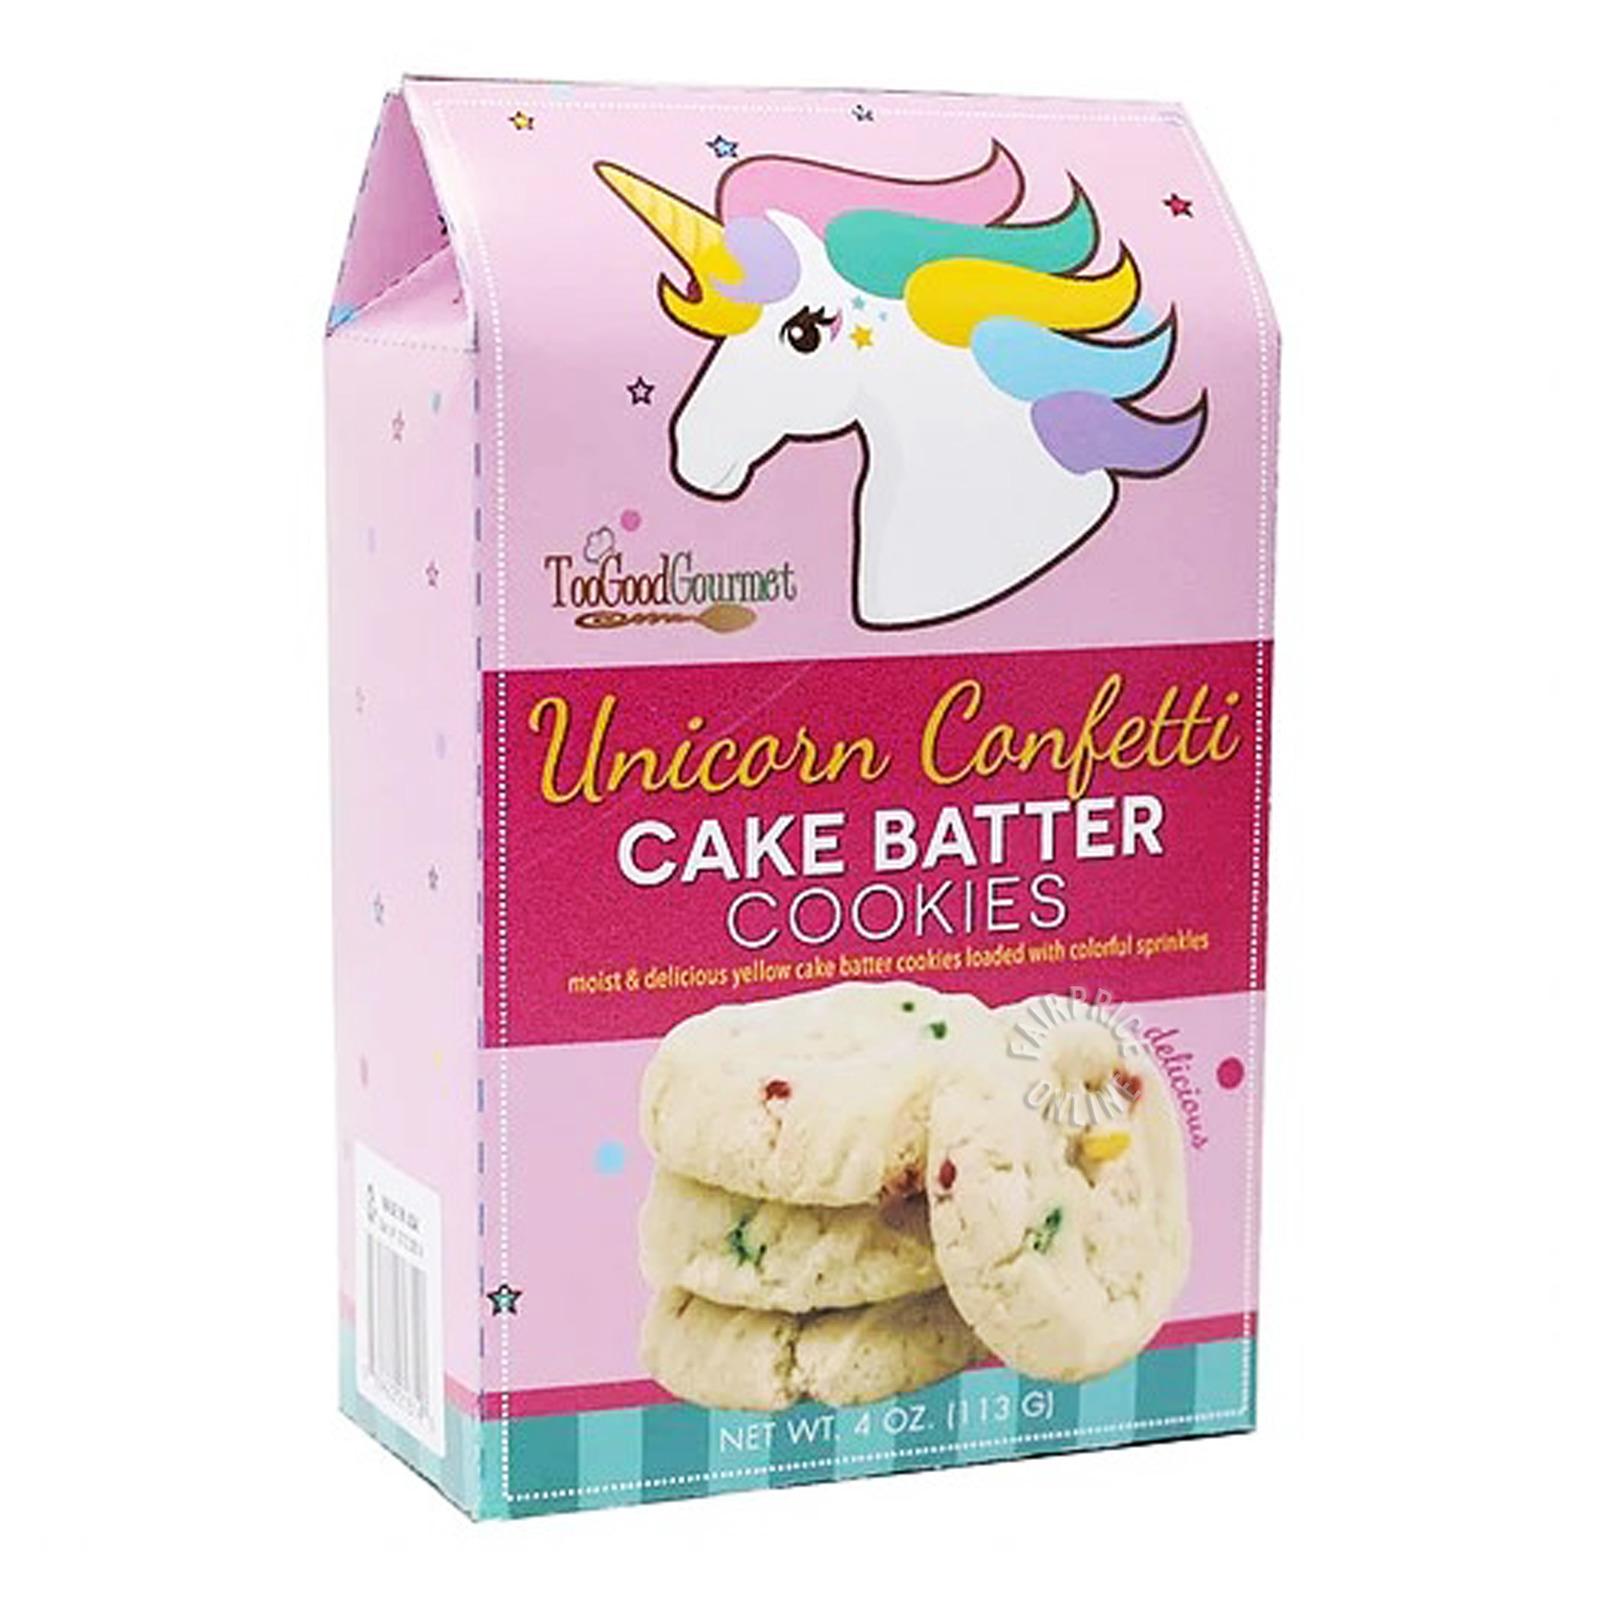 TGG Cake Batter Cookies - Unicorn Confetti